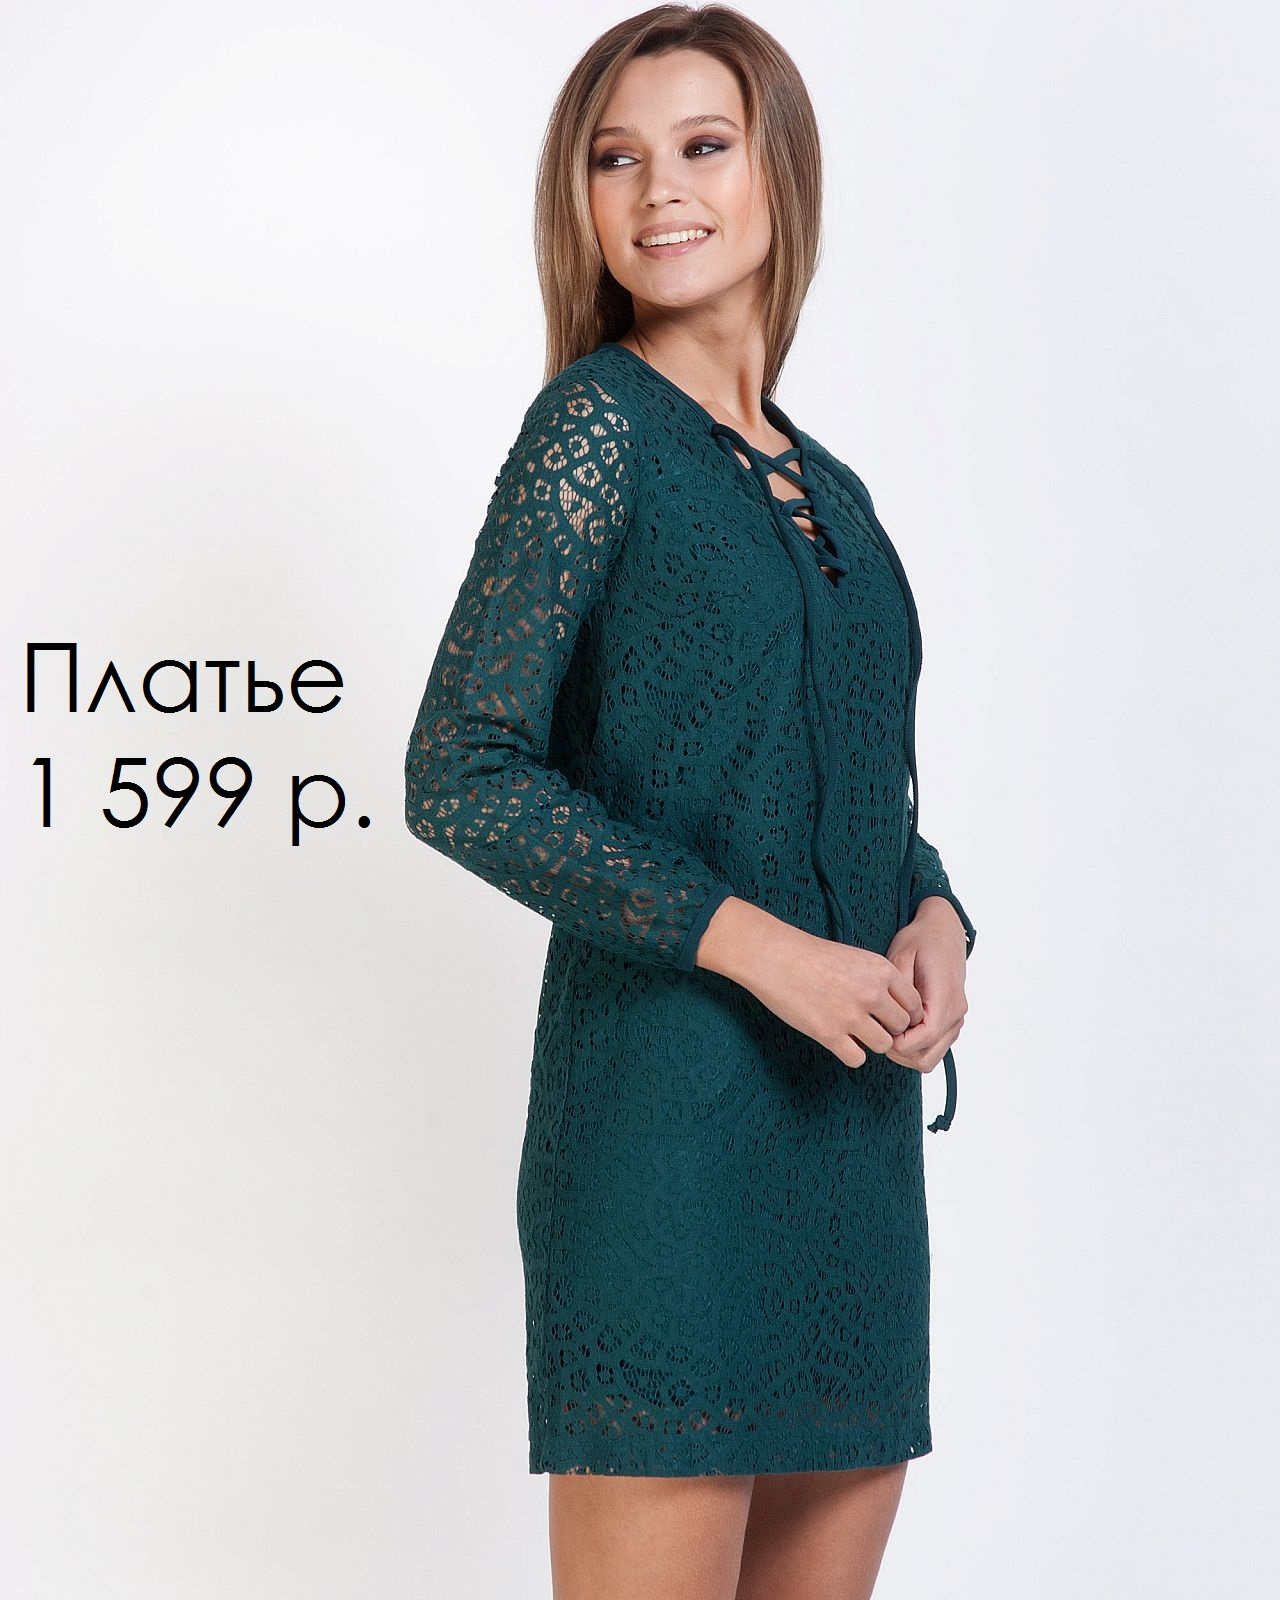 Магазин одежды инсити